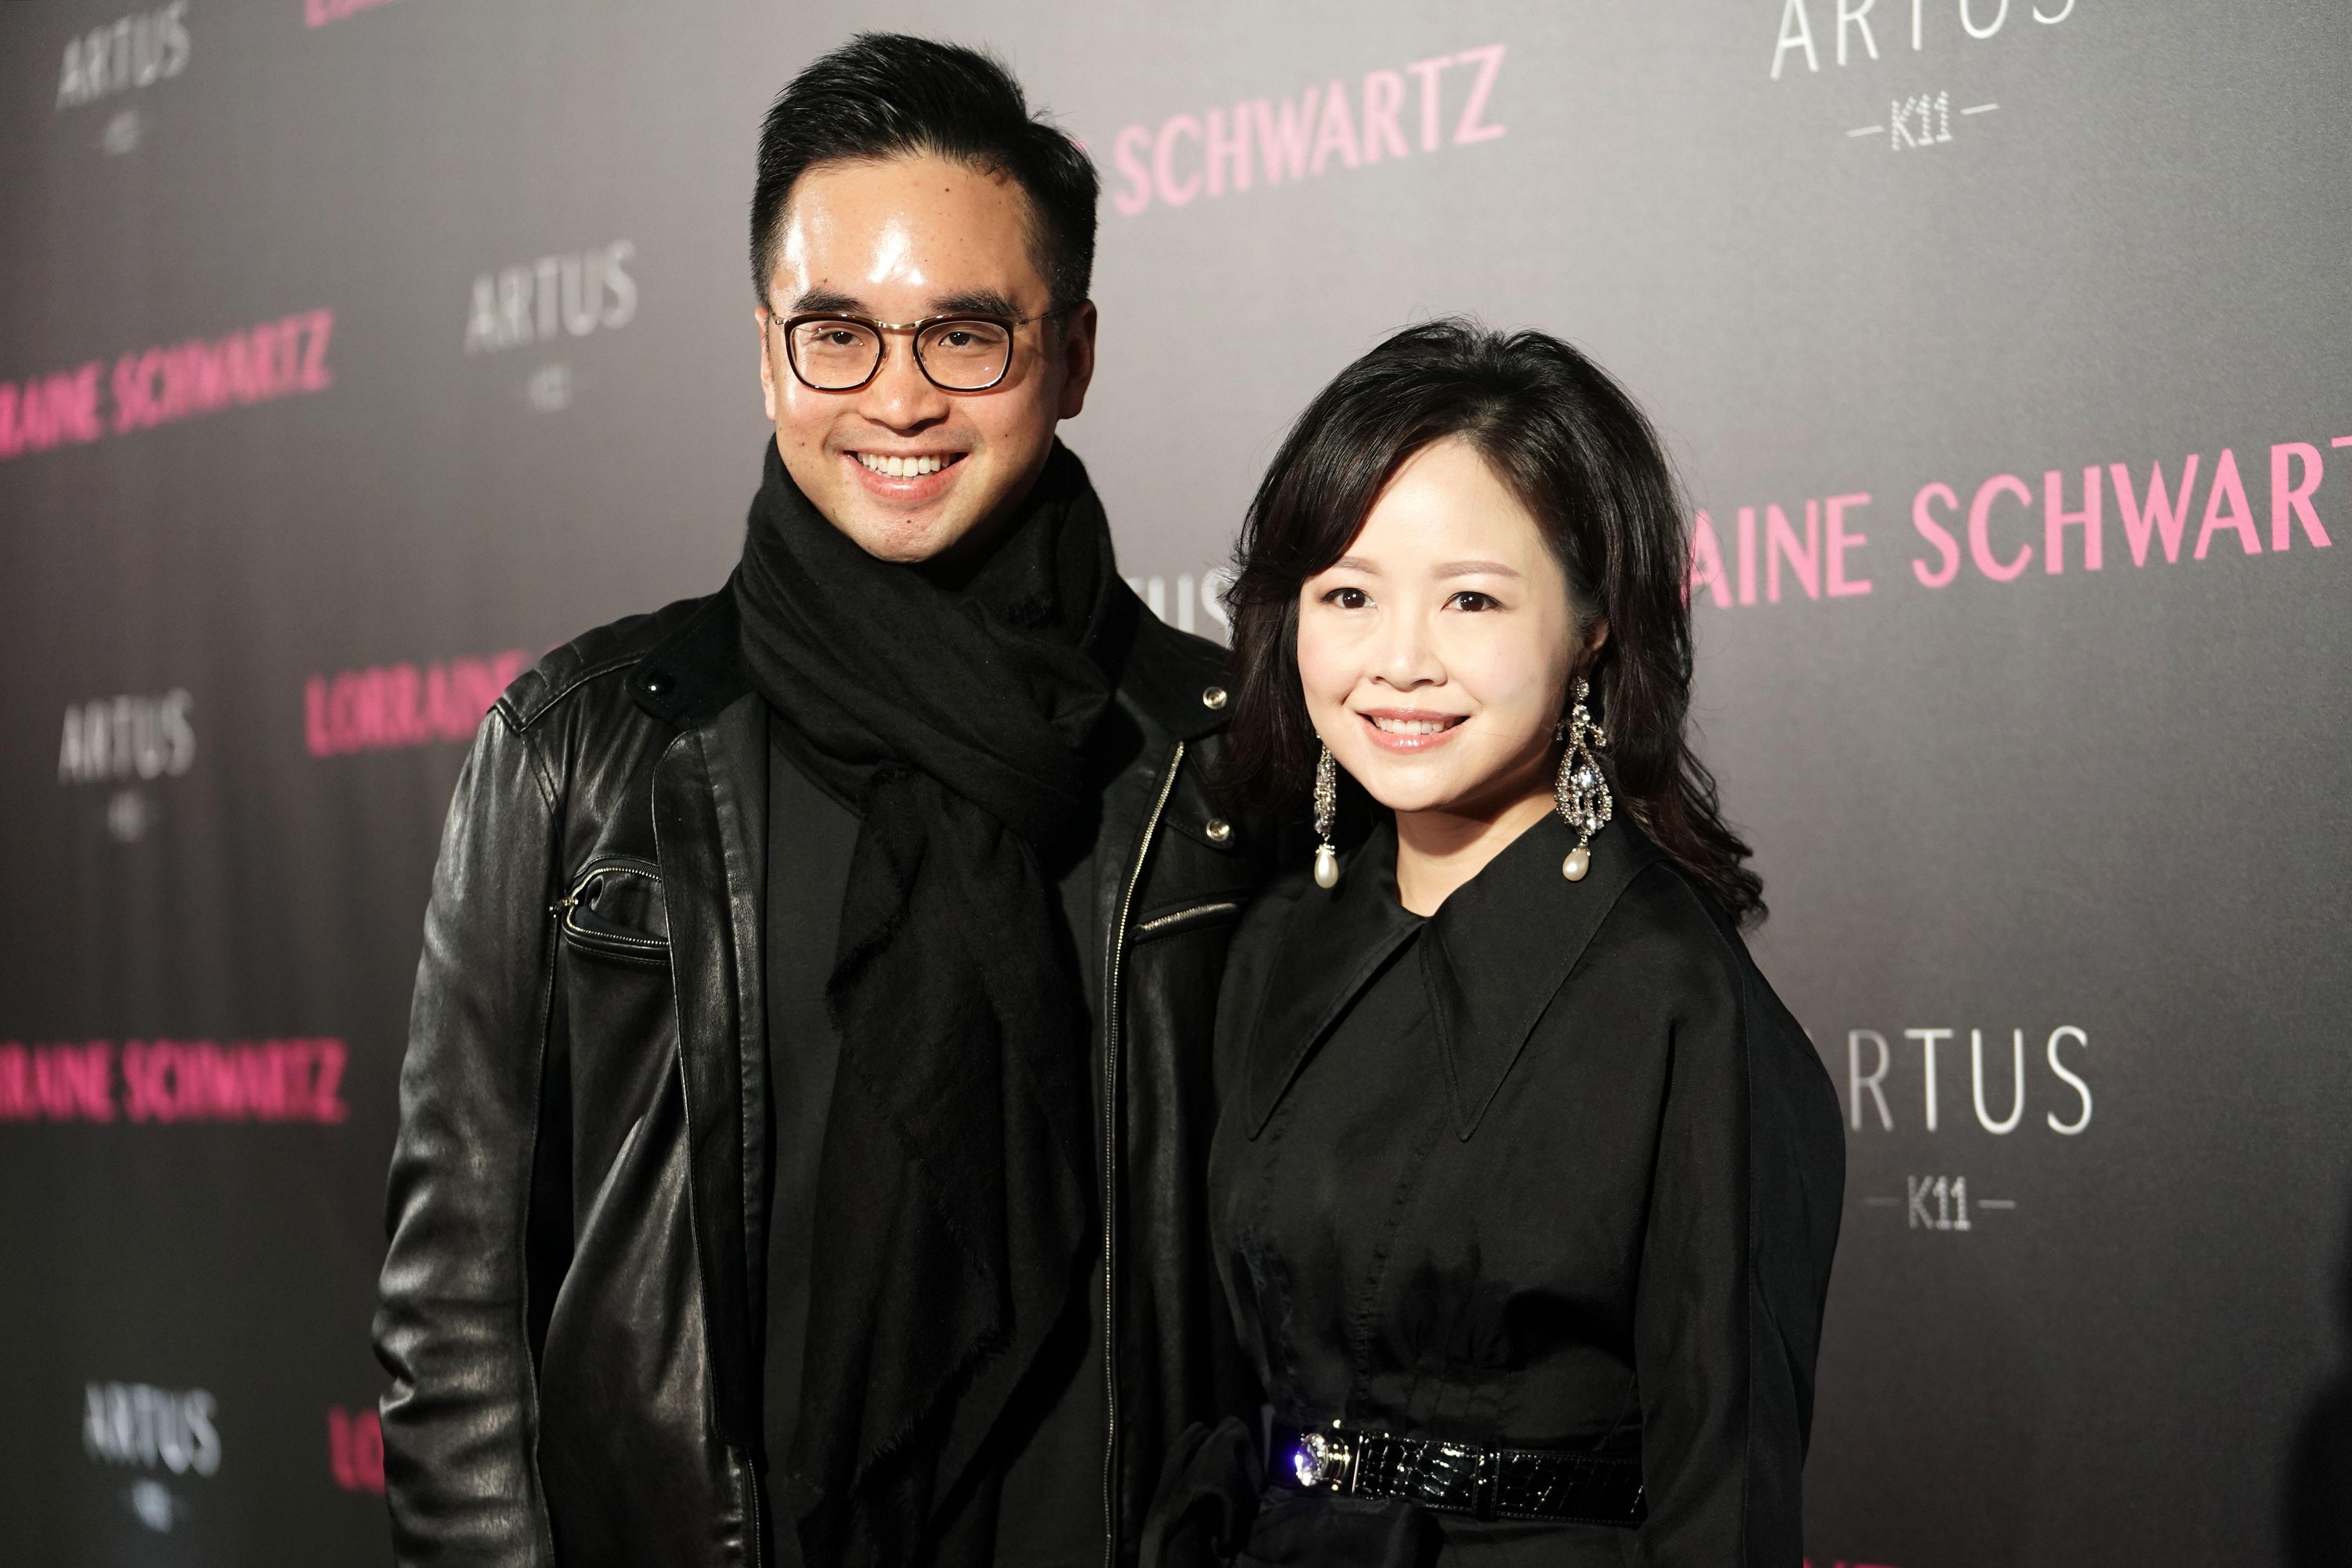 Adrien Cheng and Jennifer Yu Adrien Cheng and Jennifer Yu celebrate the jewelry of Lorraine Schwartz during Hong Kong Art Basel on March 24.